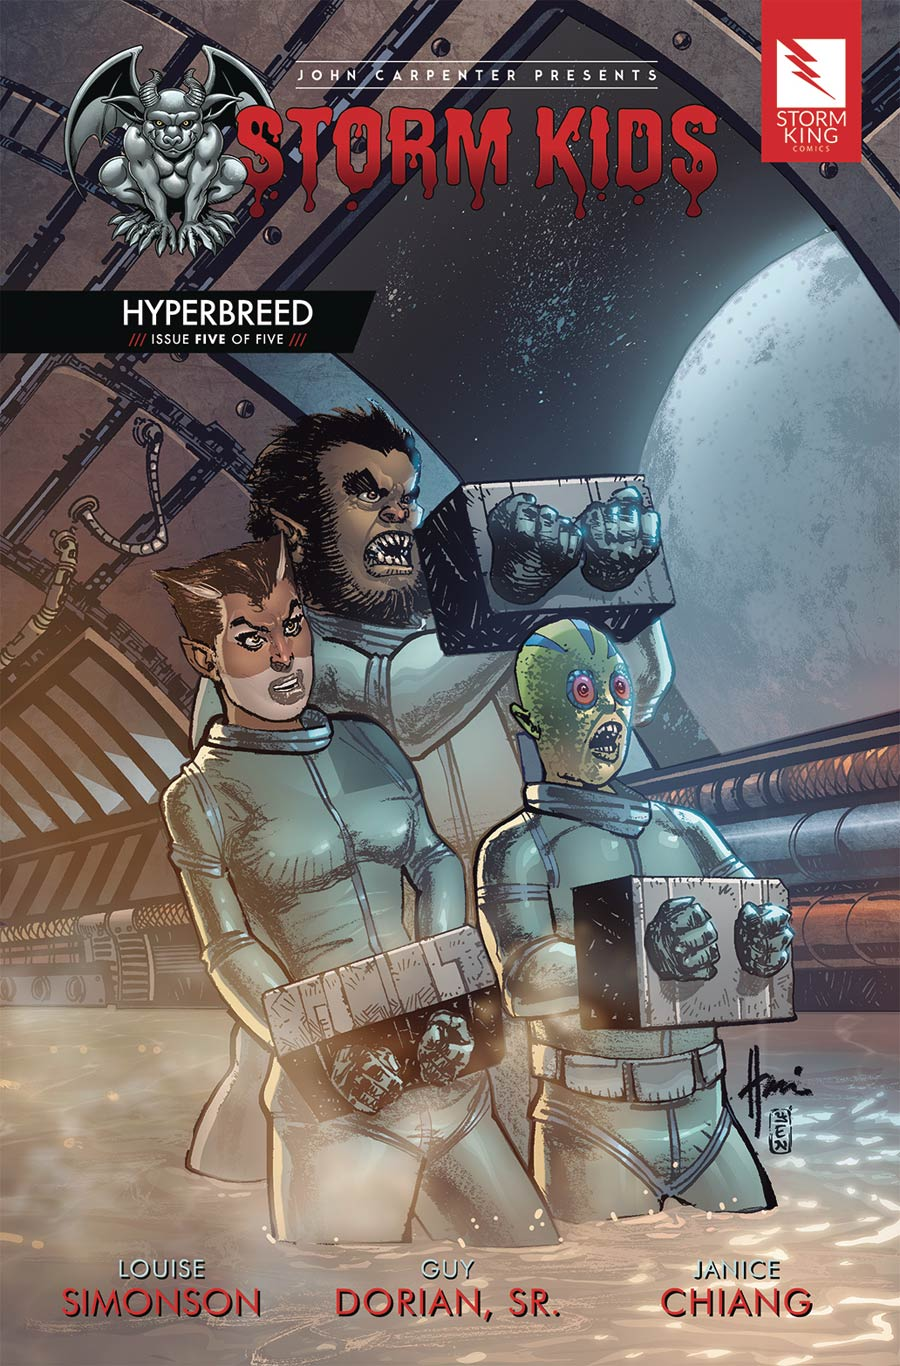 Storm Kids Hyperbreed #5